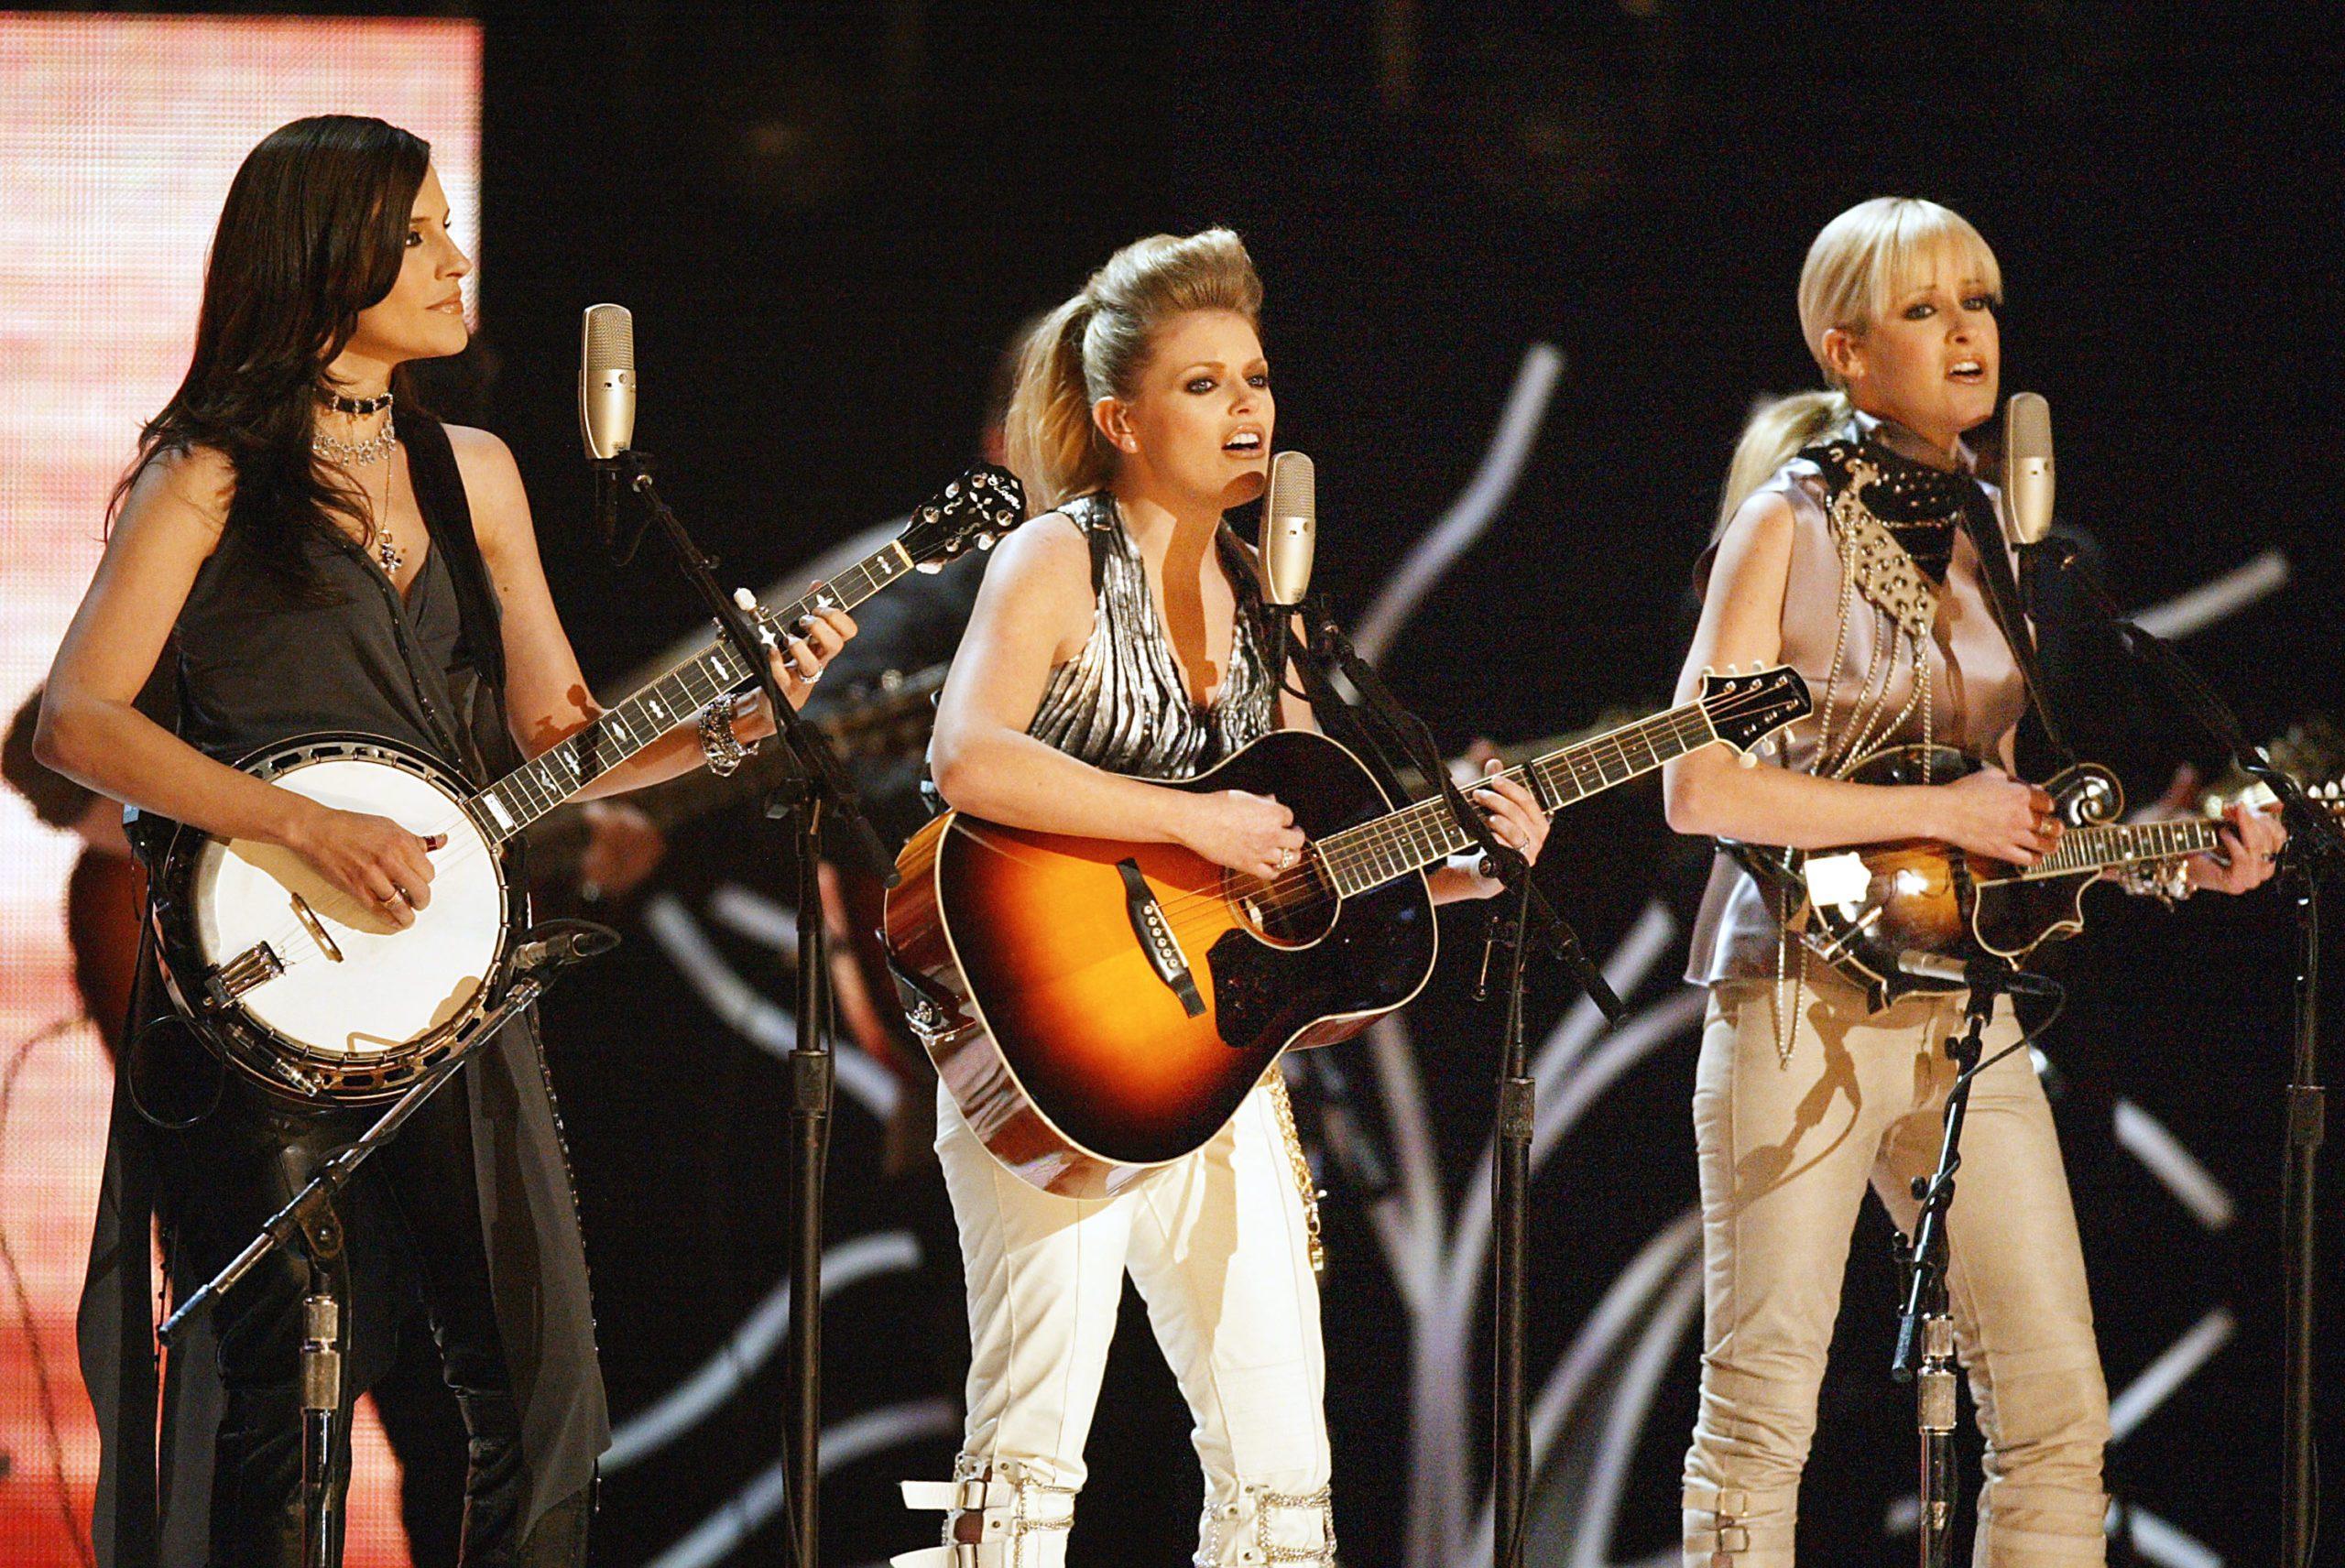 45th Annual Grammy Awards - Show